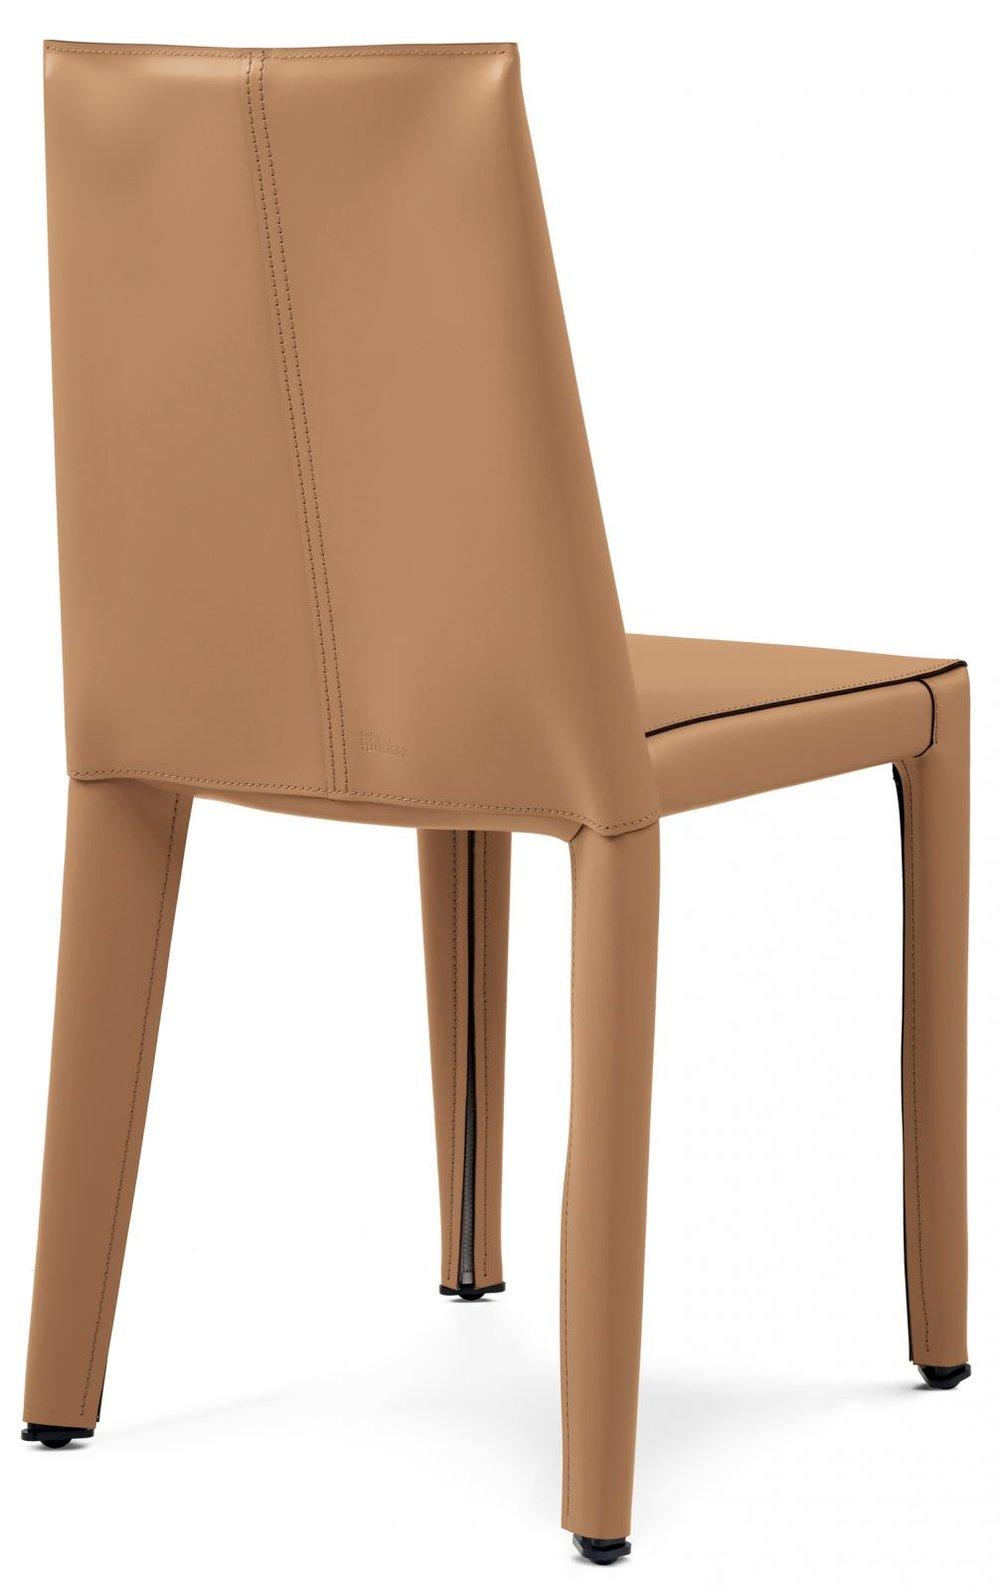 modern-office-furniture-chairs-Italian-designer-furniture (16).jpg